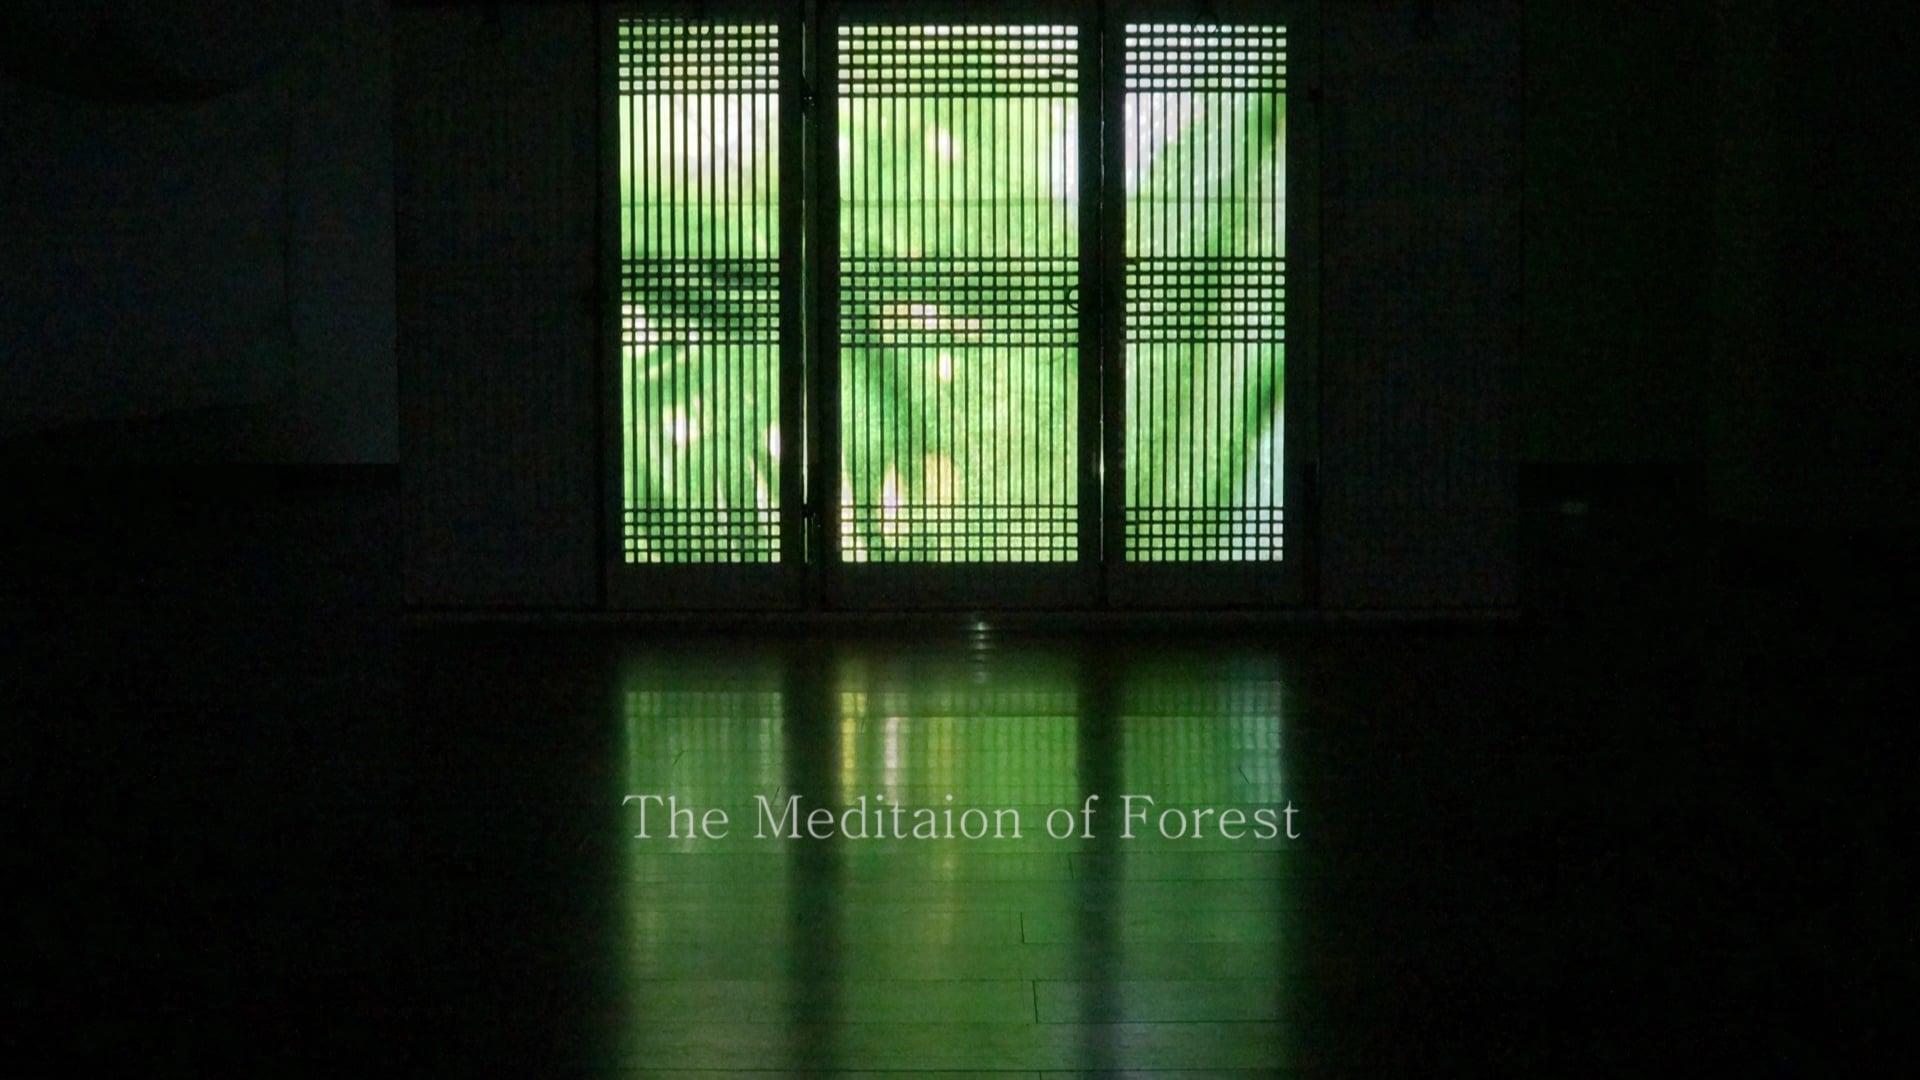 The Landscape of Meditation by NK HONG (aka Nakyum Hong ) 2013  홍나겸 사유(思惟)의풍경